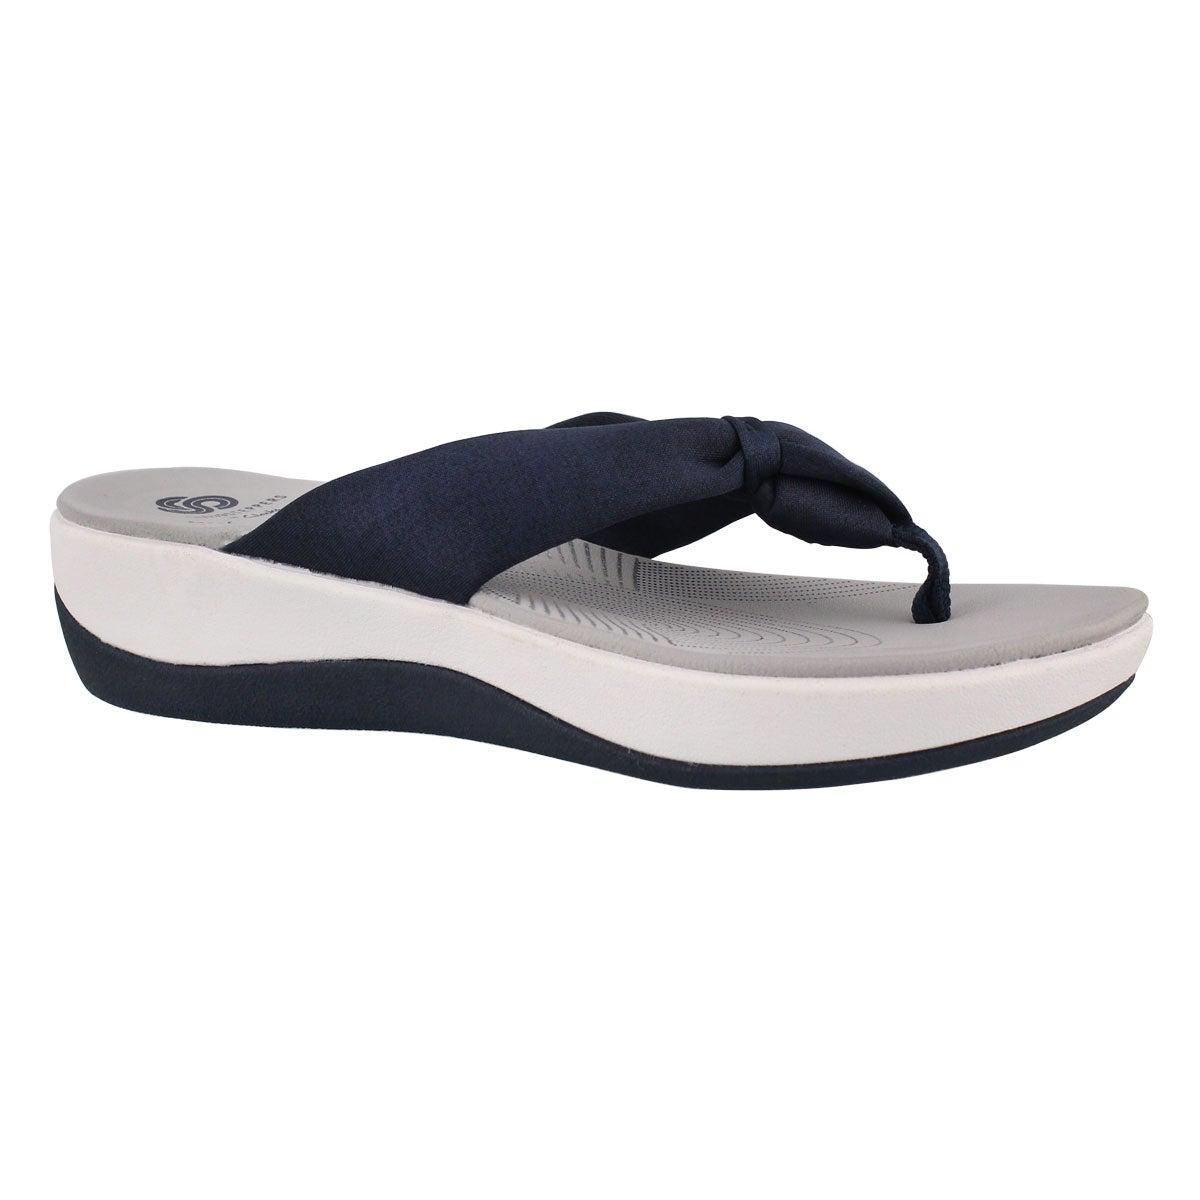 Women's ARLA GLISON blue thong wedge sandal